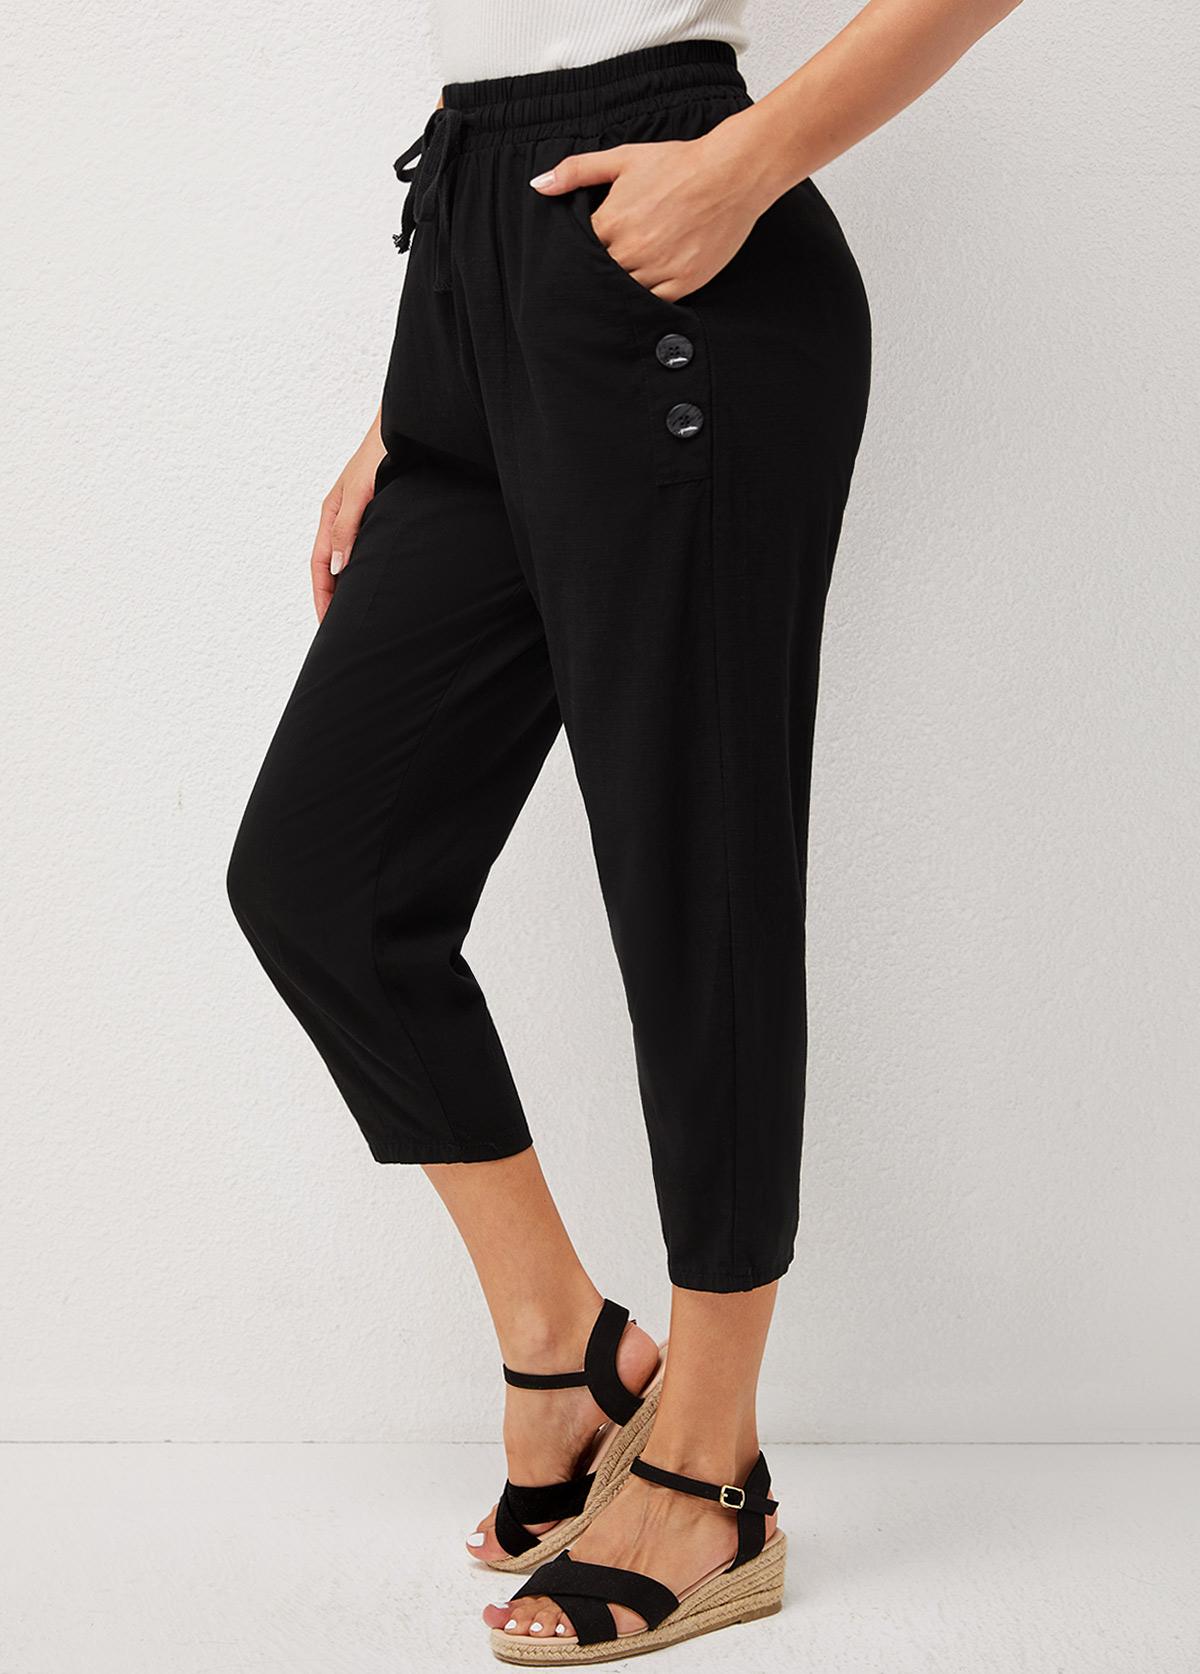 Pocket Solid Decorative Button Tie Front Pants